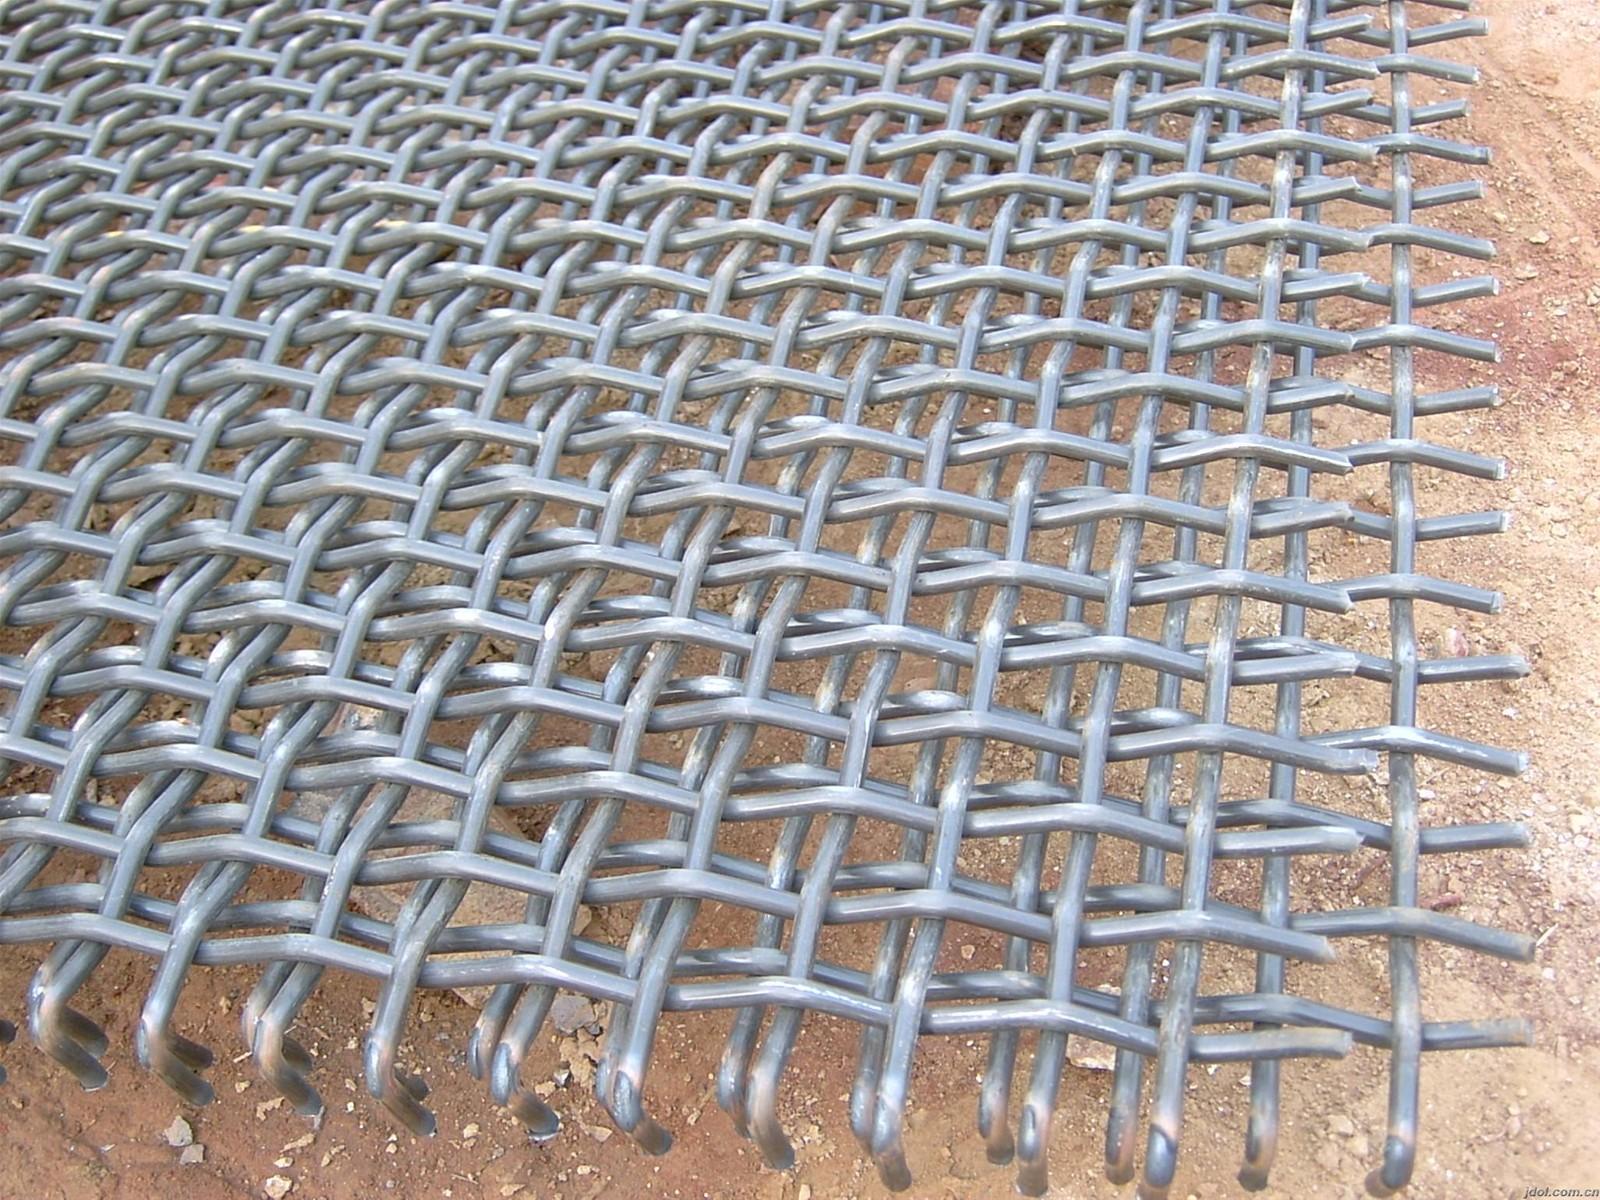 65Mn high tensile vibrating woven screen Mesh purchasing, souring ...